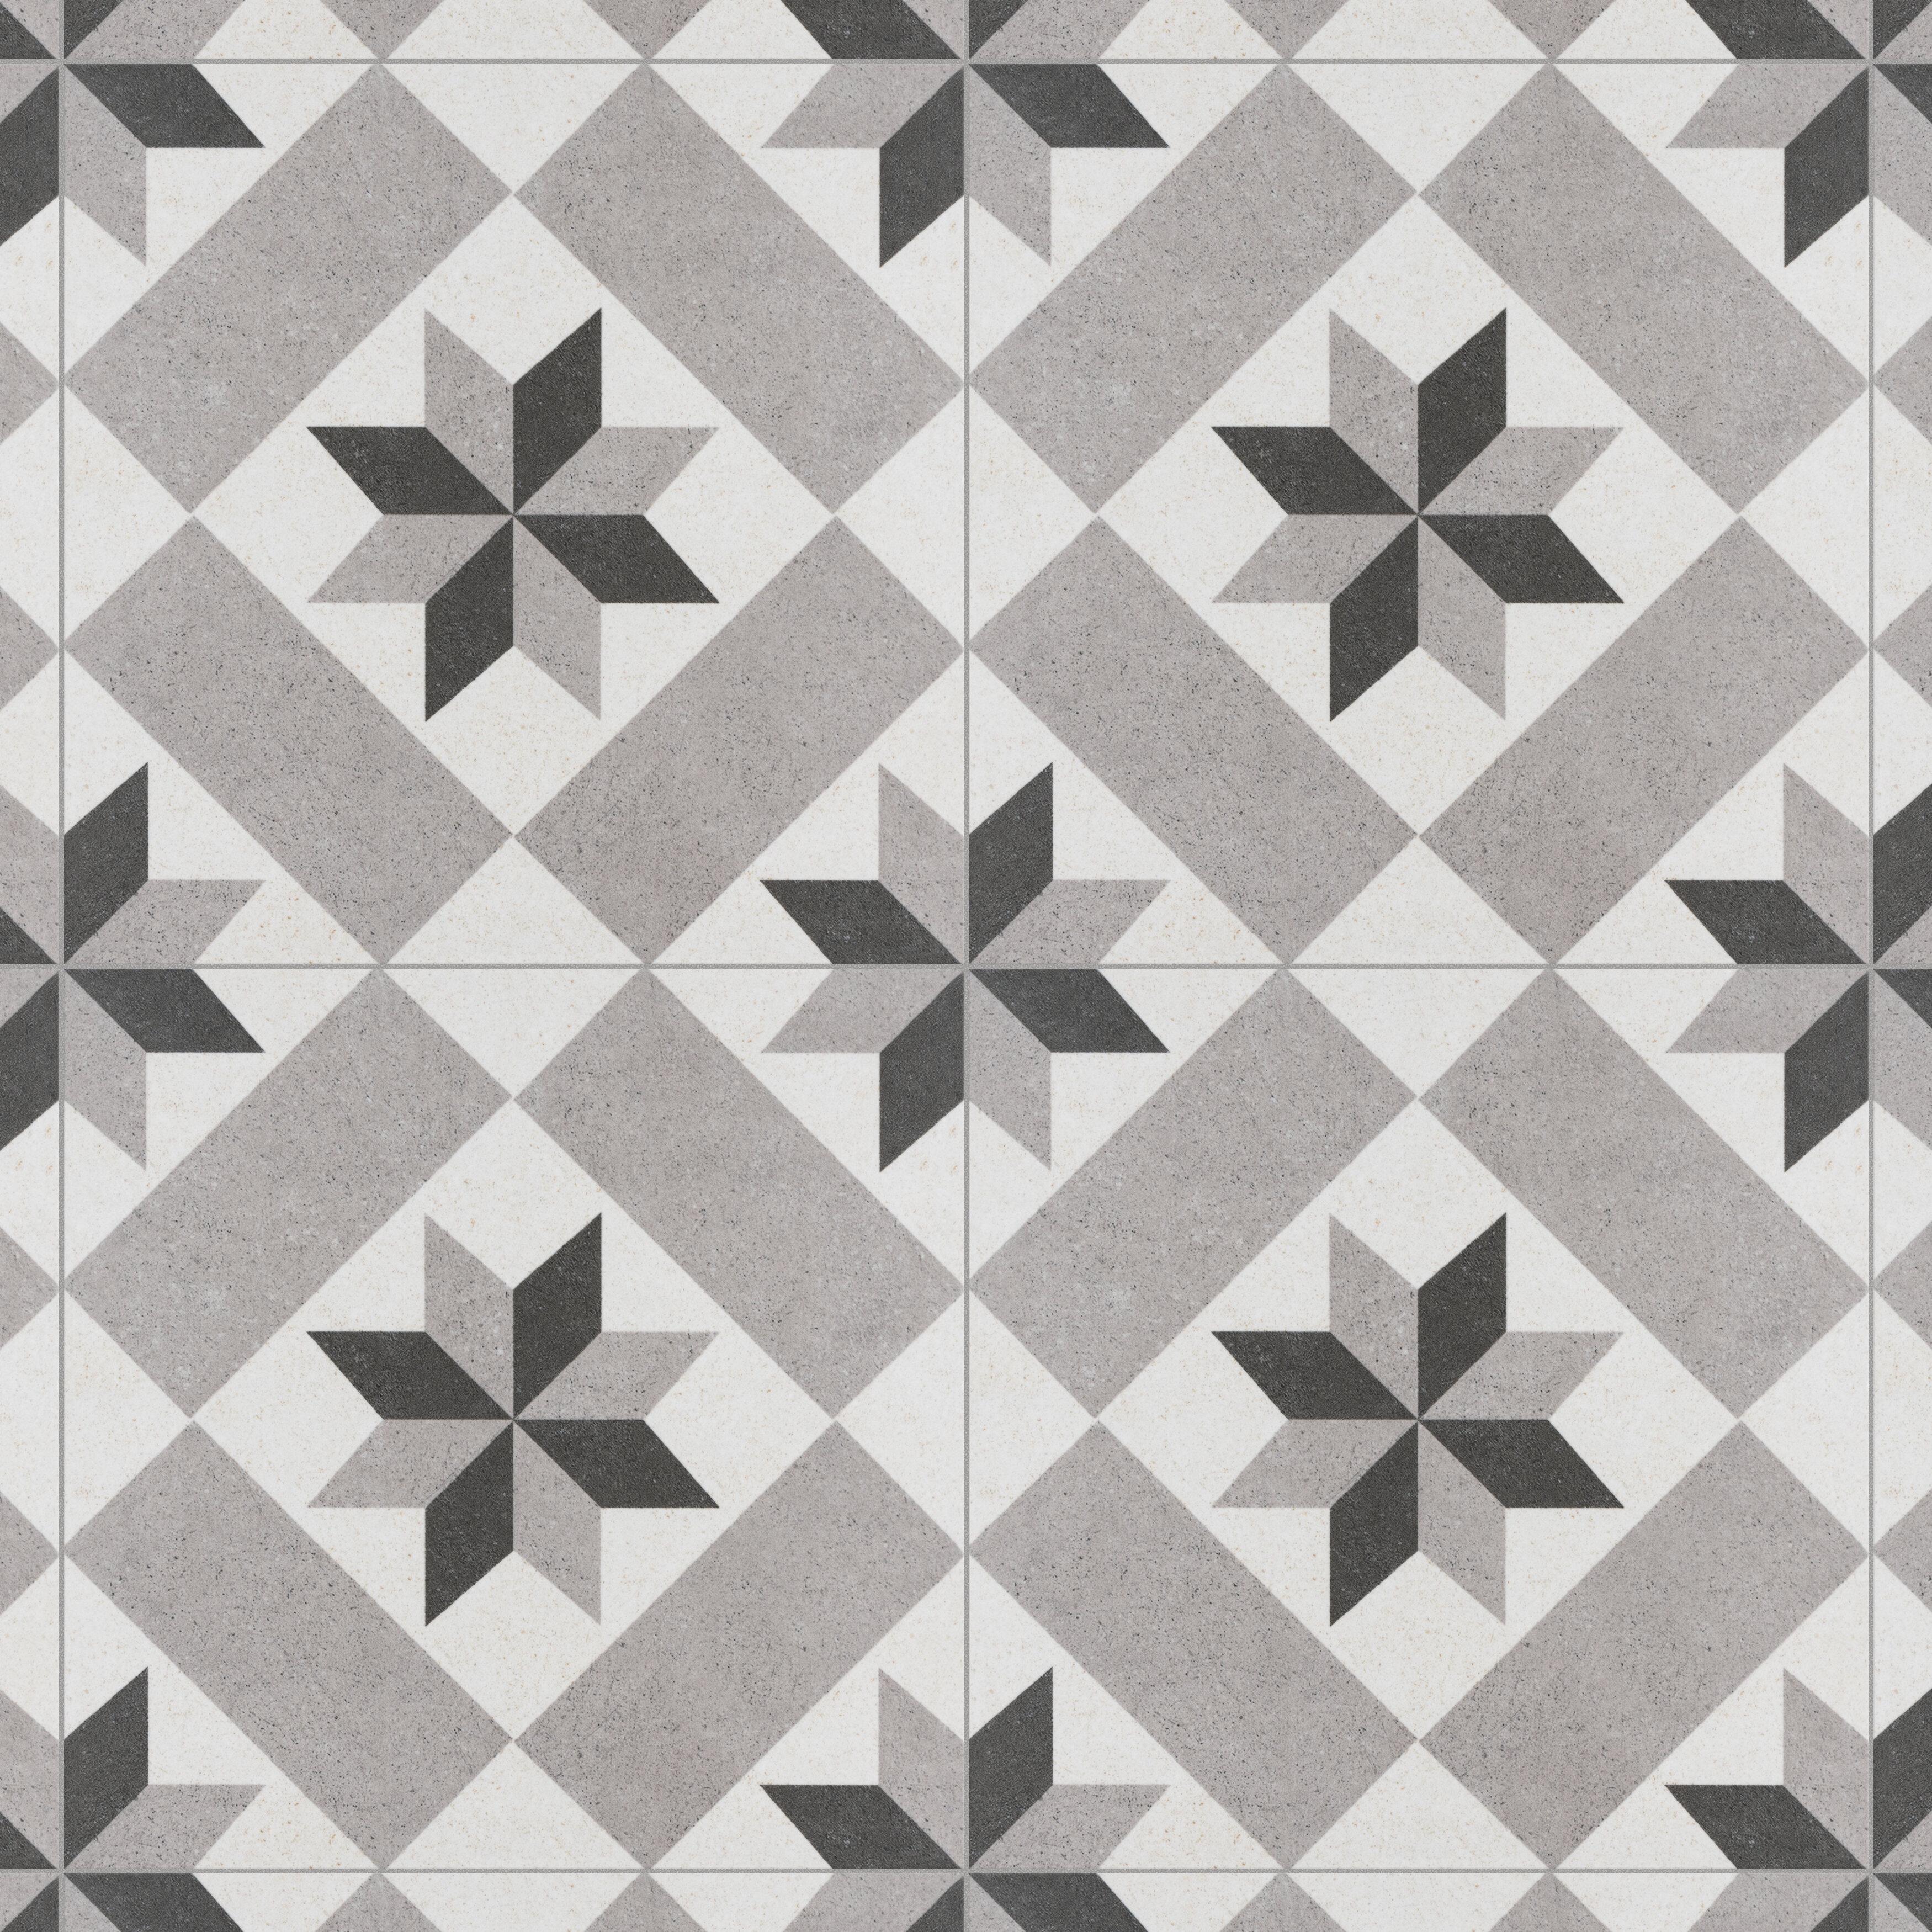 Elitetile Annata Star 10 X 10 Porcelain Wall Floor Tile Wayfair